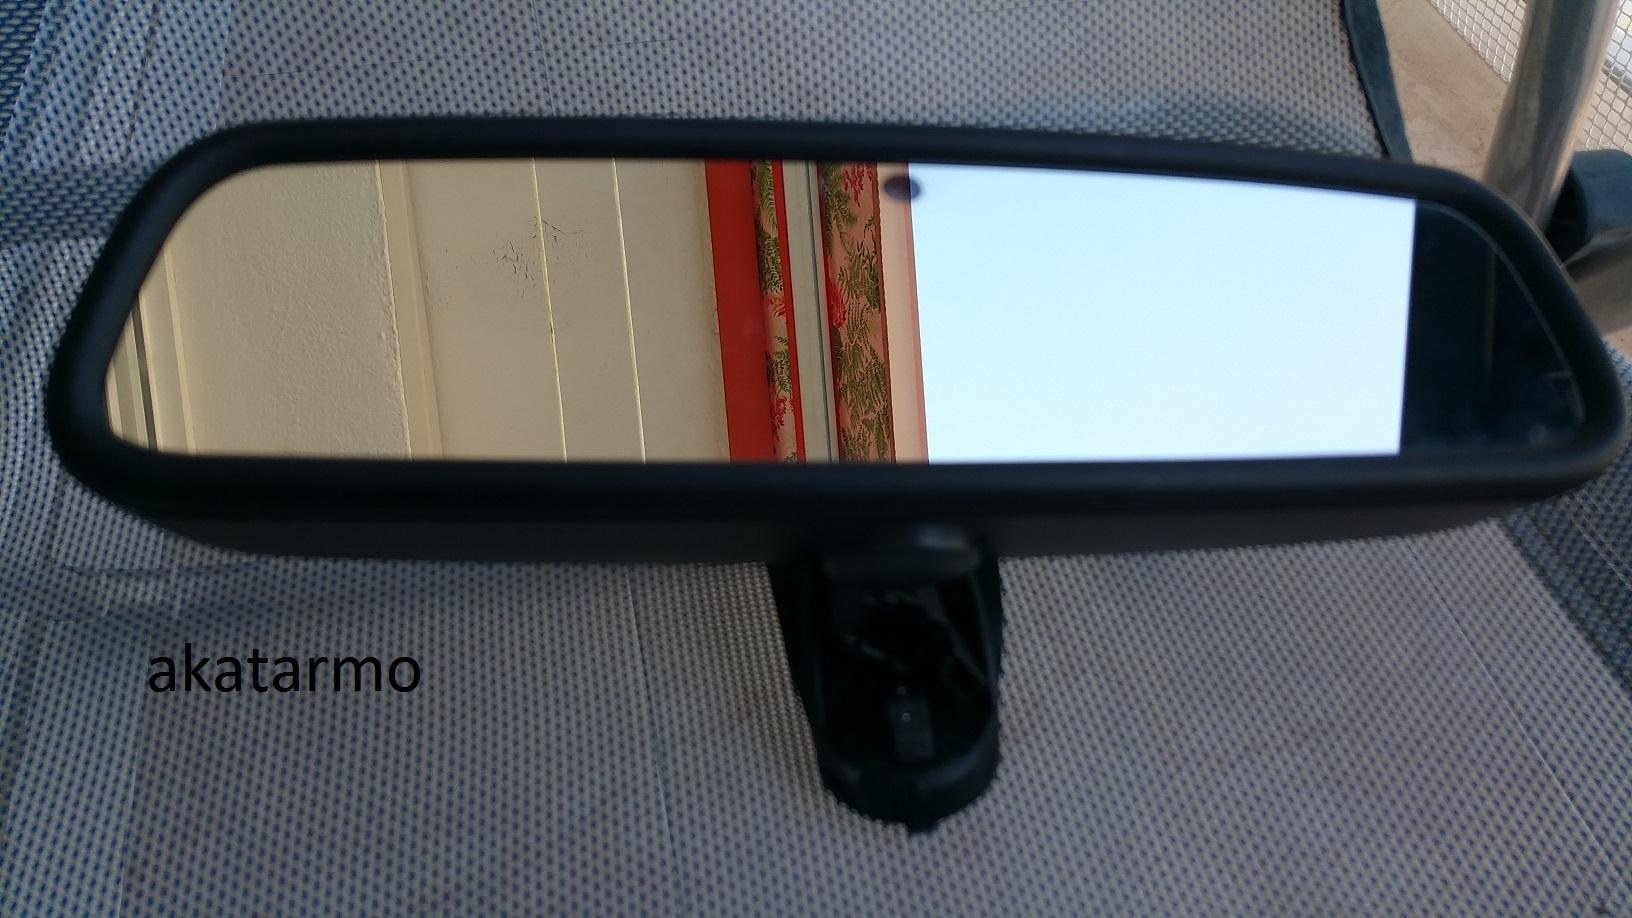 Vendo espejo retrovisor interior fotocrom tico con for Espejo retrovisor interior